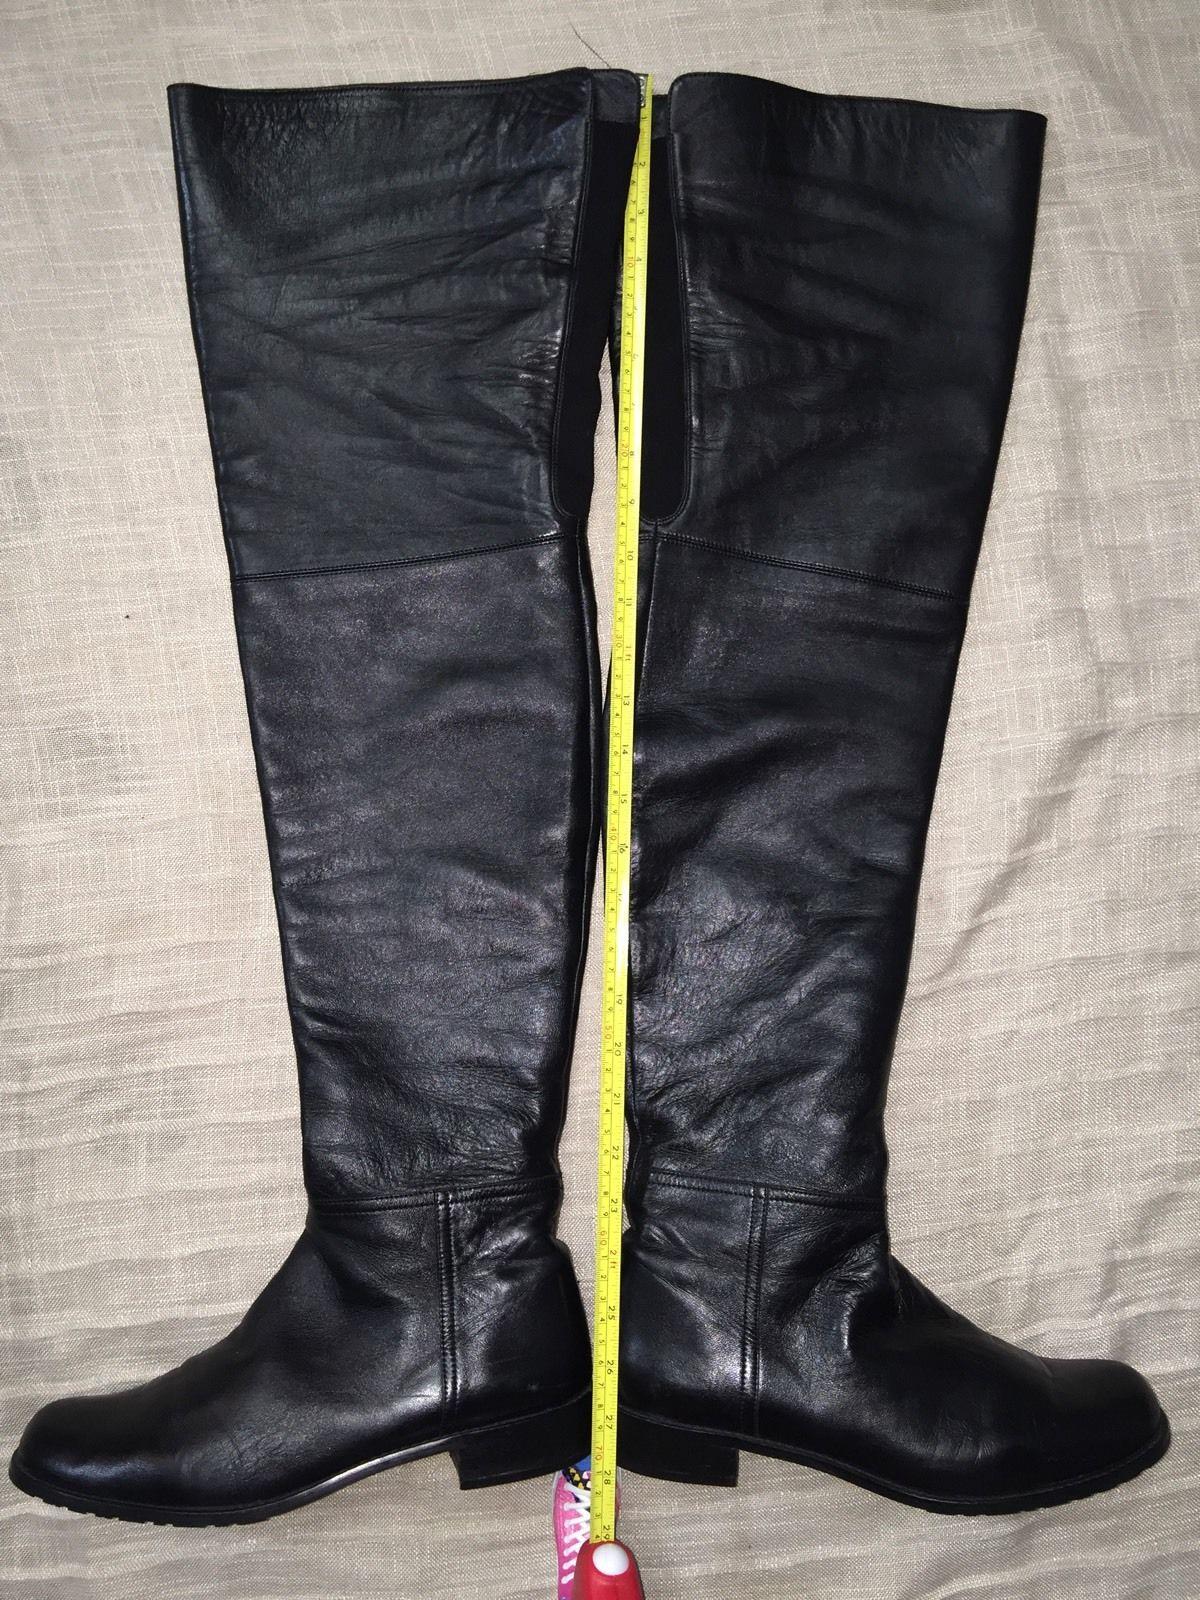 ebay leather stuart weitzman quot hilo quot thigh high boots